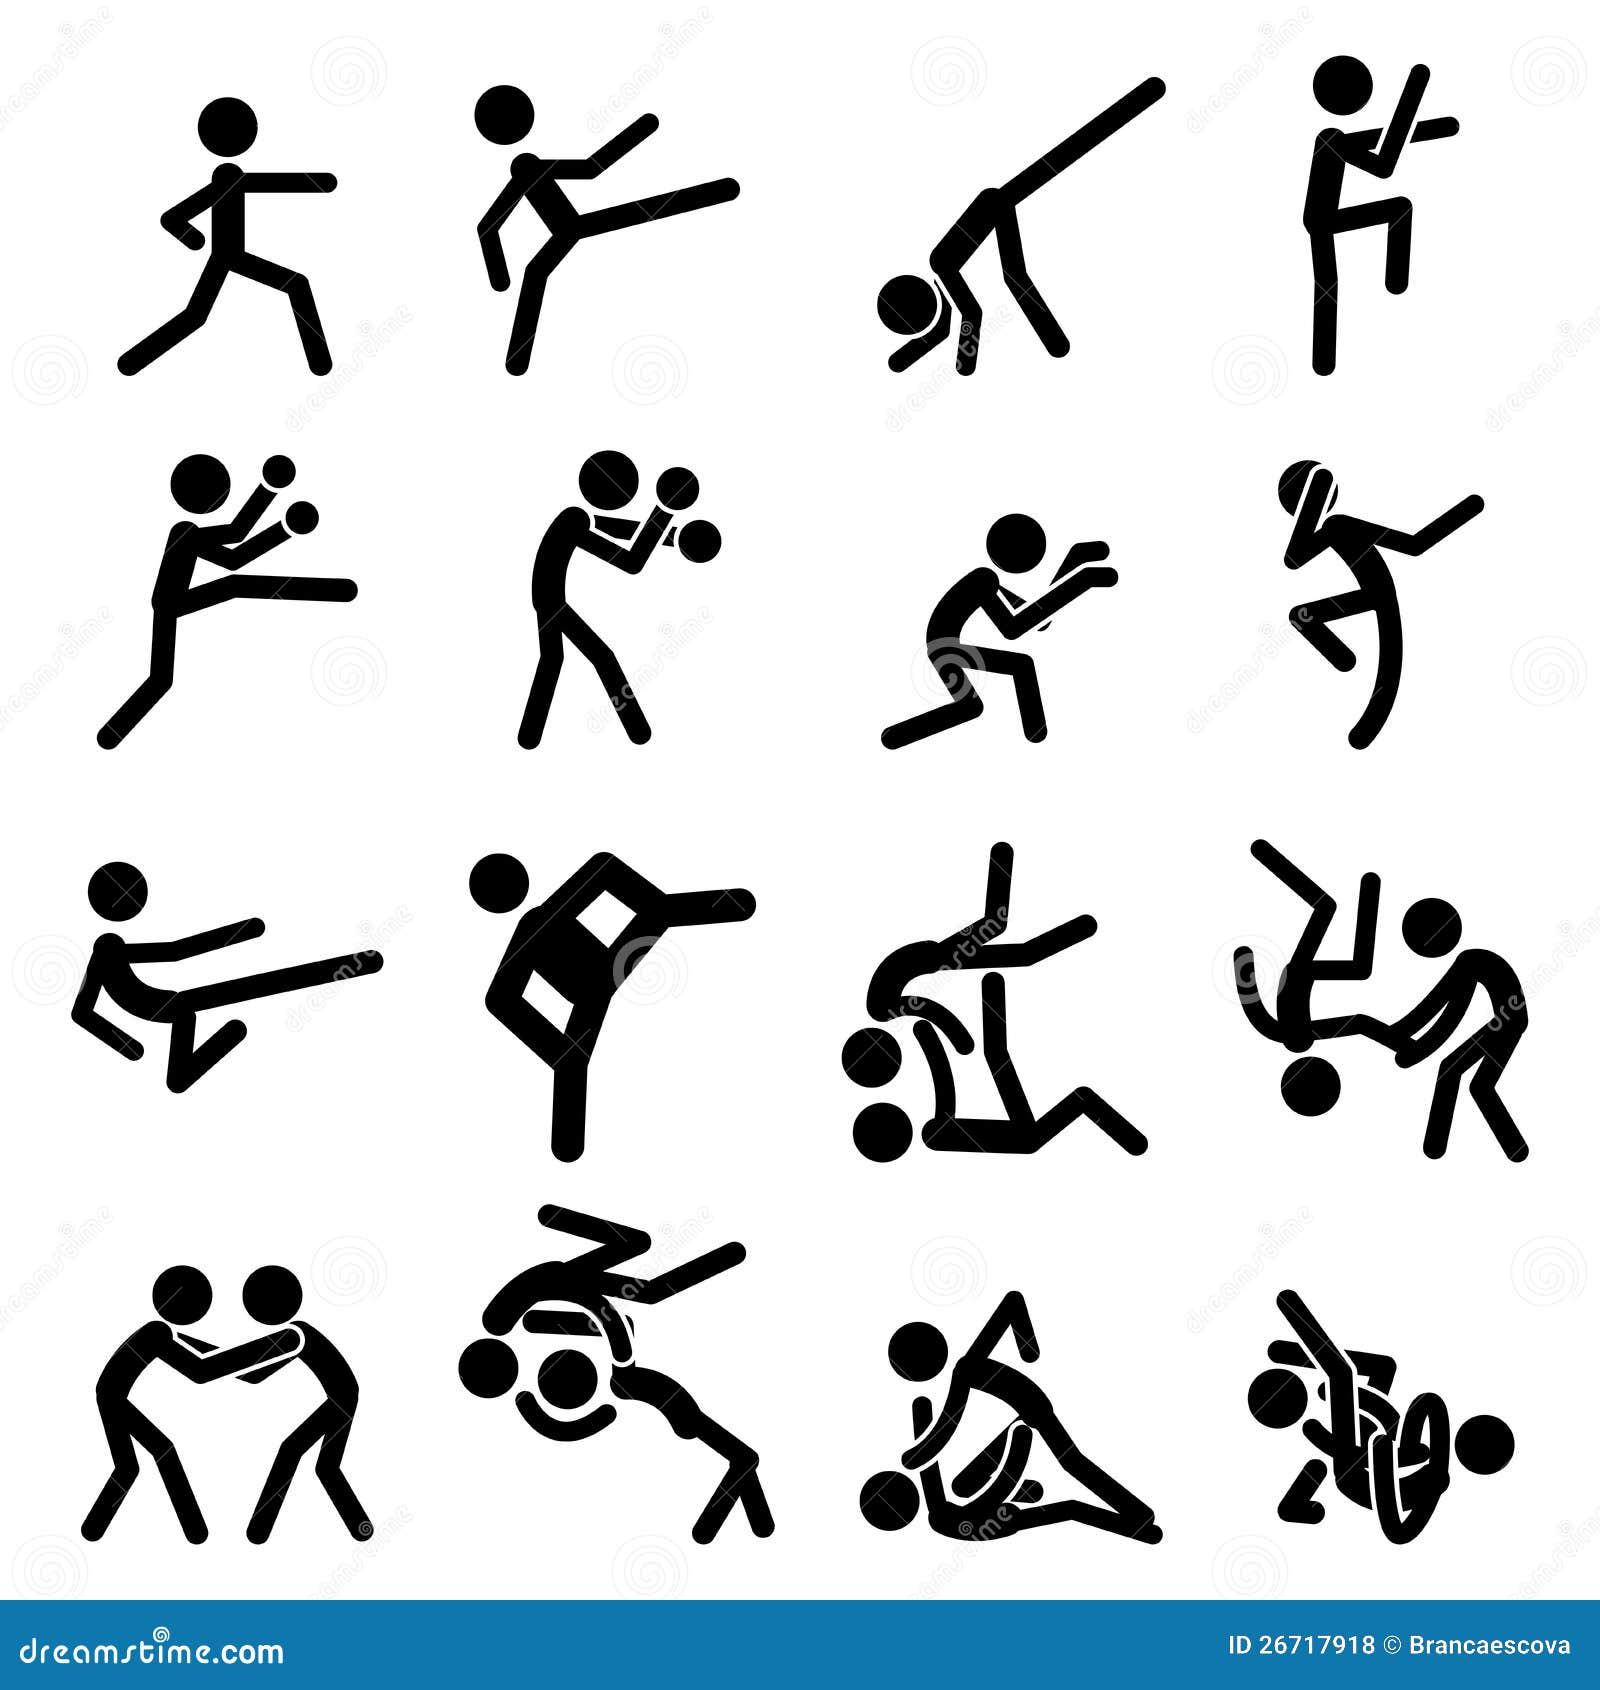 dejta gratis sport date